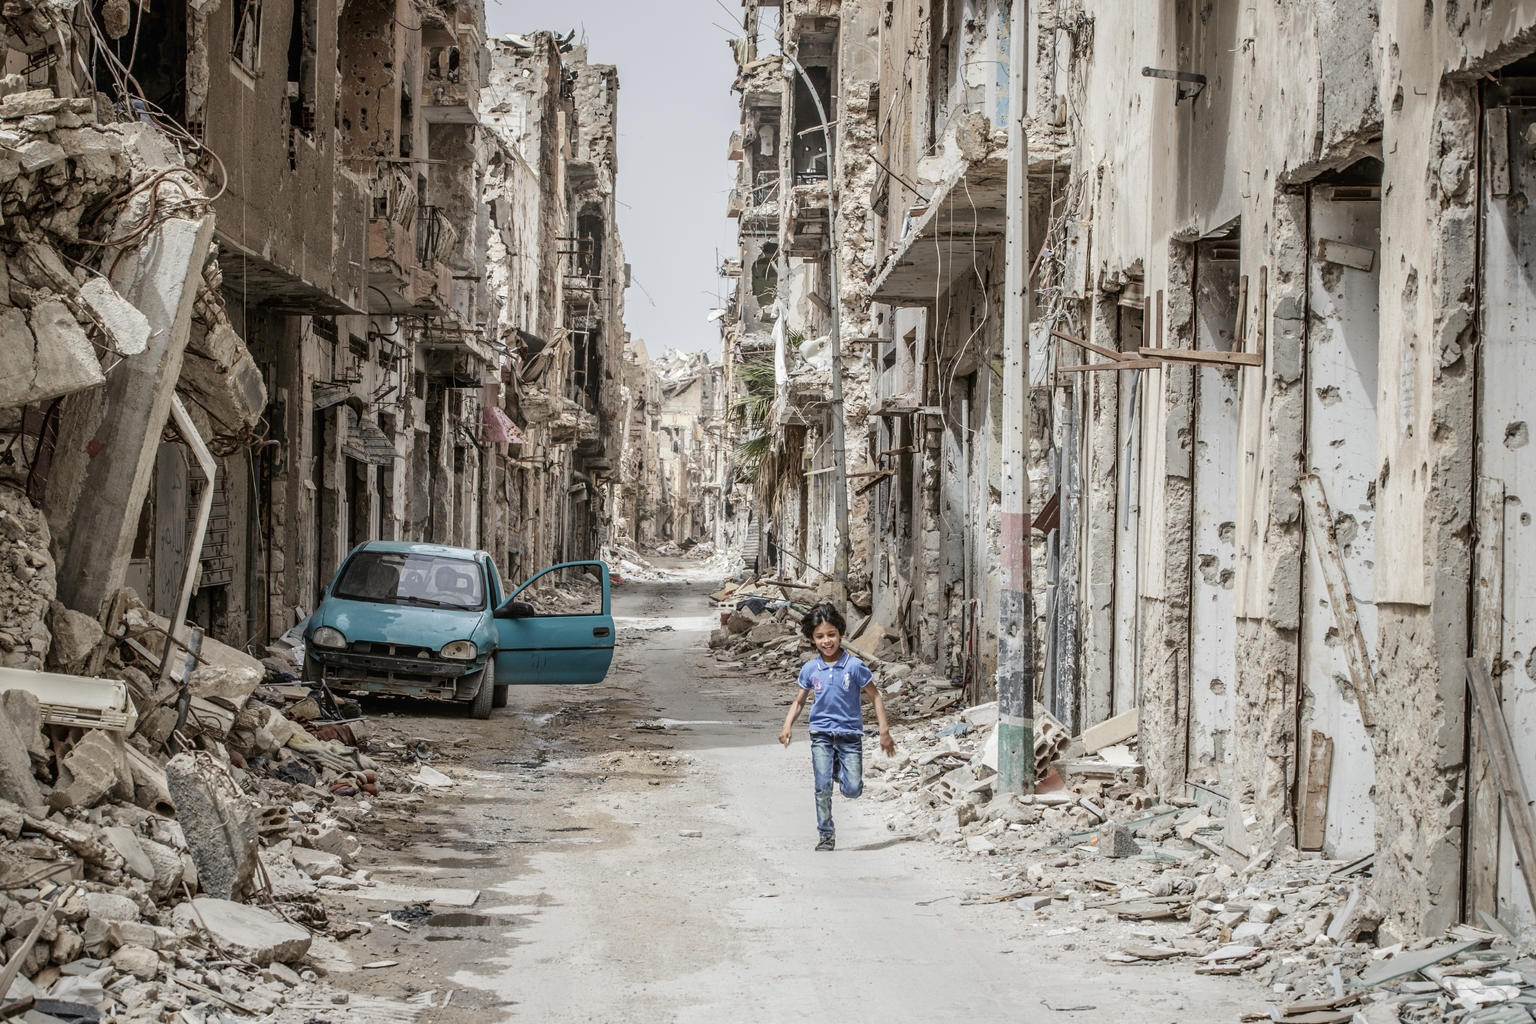 A child runs through the debris in a destroyed town